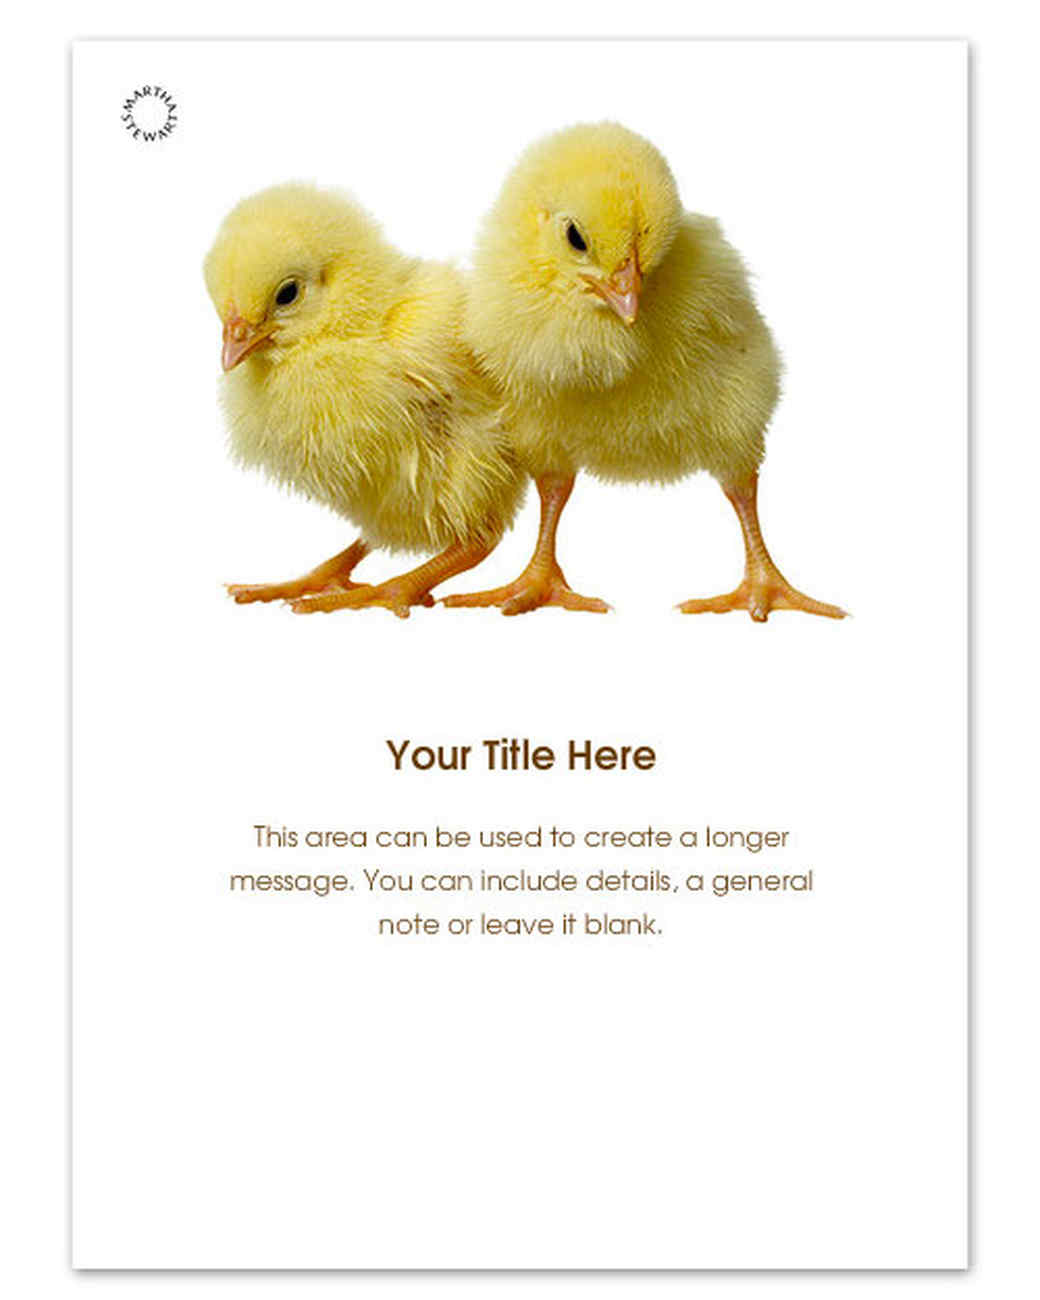 ping_irresistible_chicks.jpg